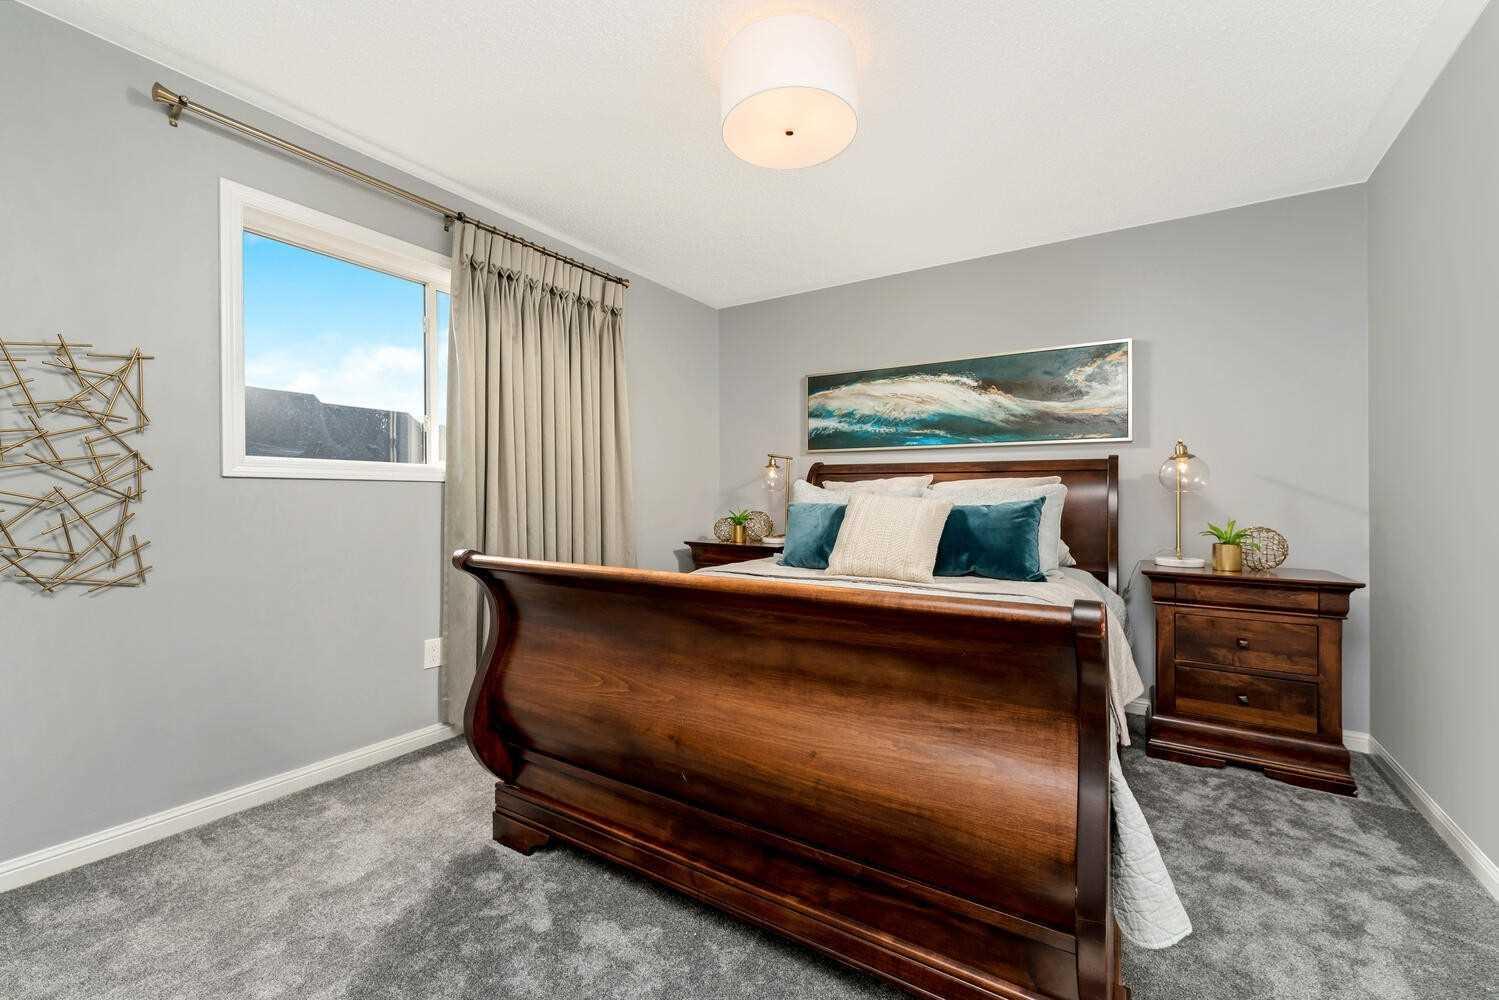 1030 Barclay Circ - Beaty Att/Row/Twnhouse for sale, 3 Bedrooms (W5400435) - #15